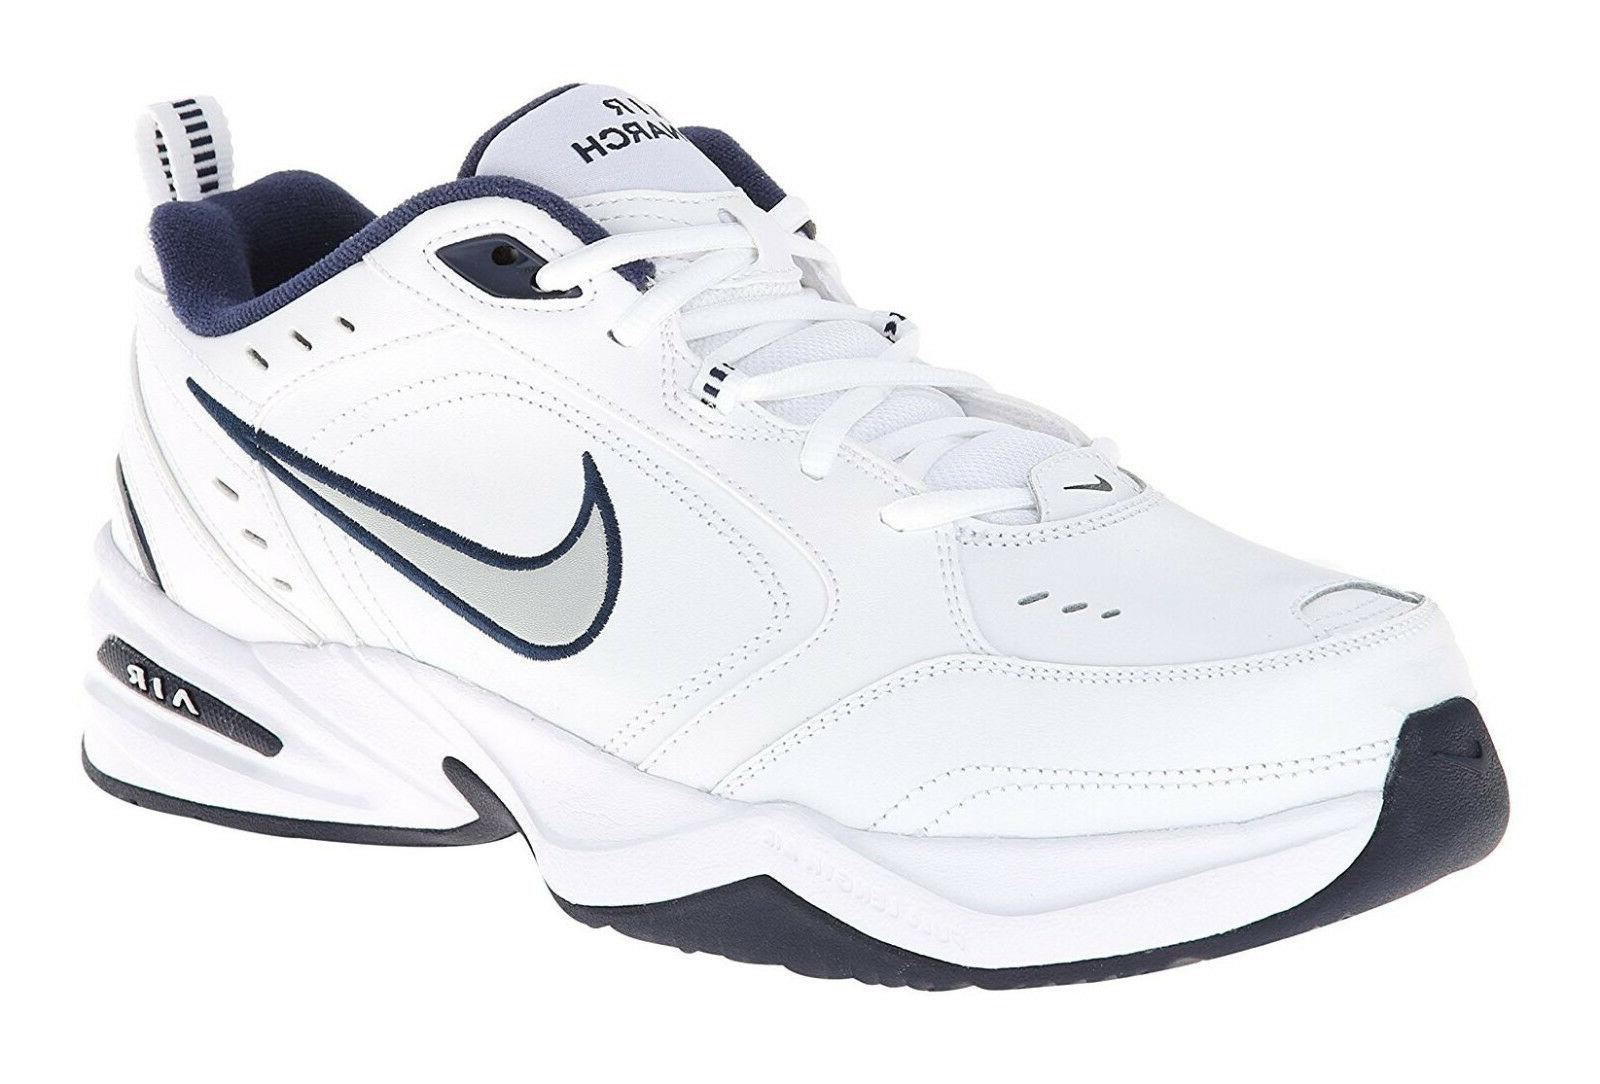 Nike Air Monarch IV White, Silver, Navy Mens Training Sneake